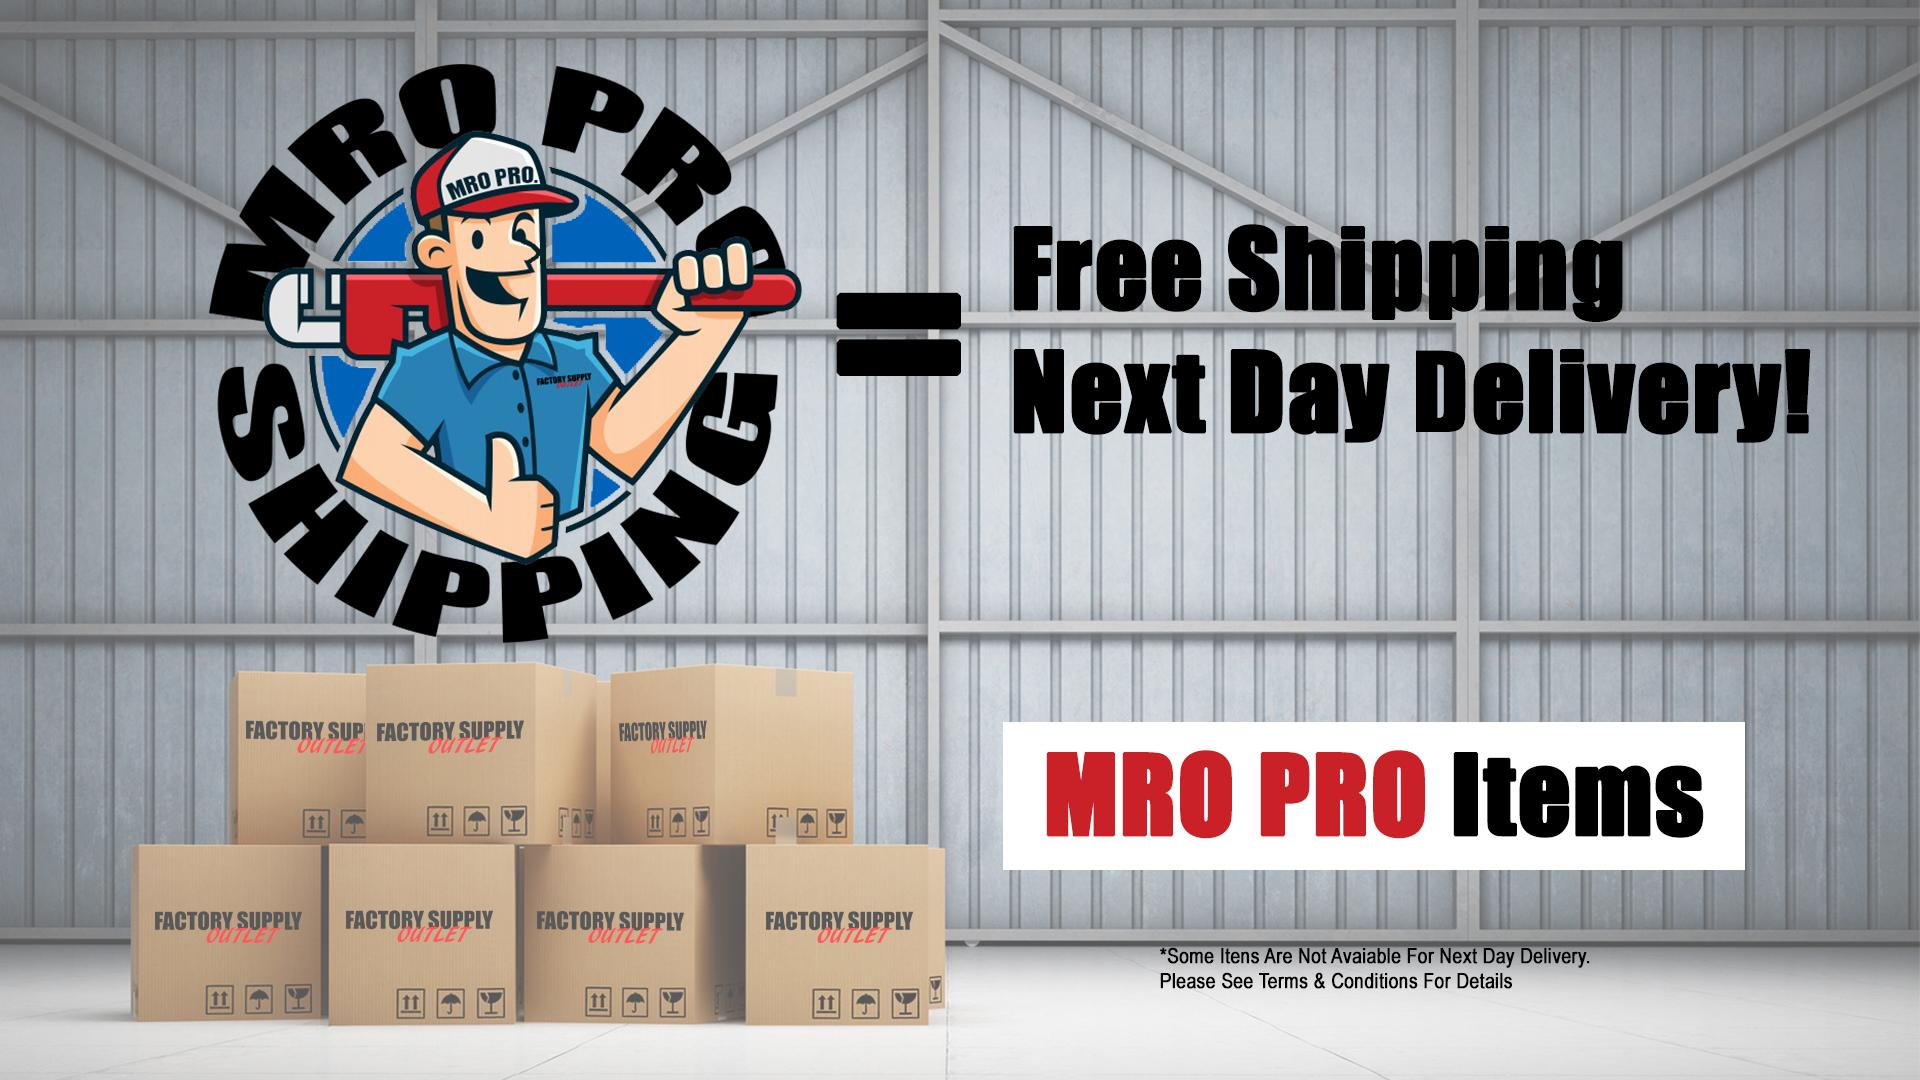 mro-pro-shipping-banner.jpg